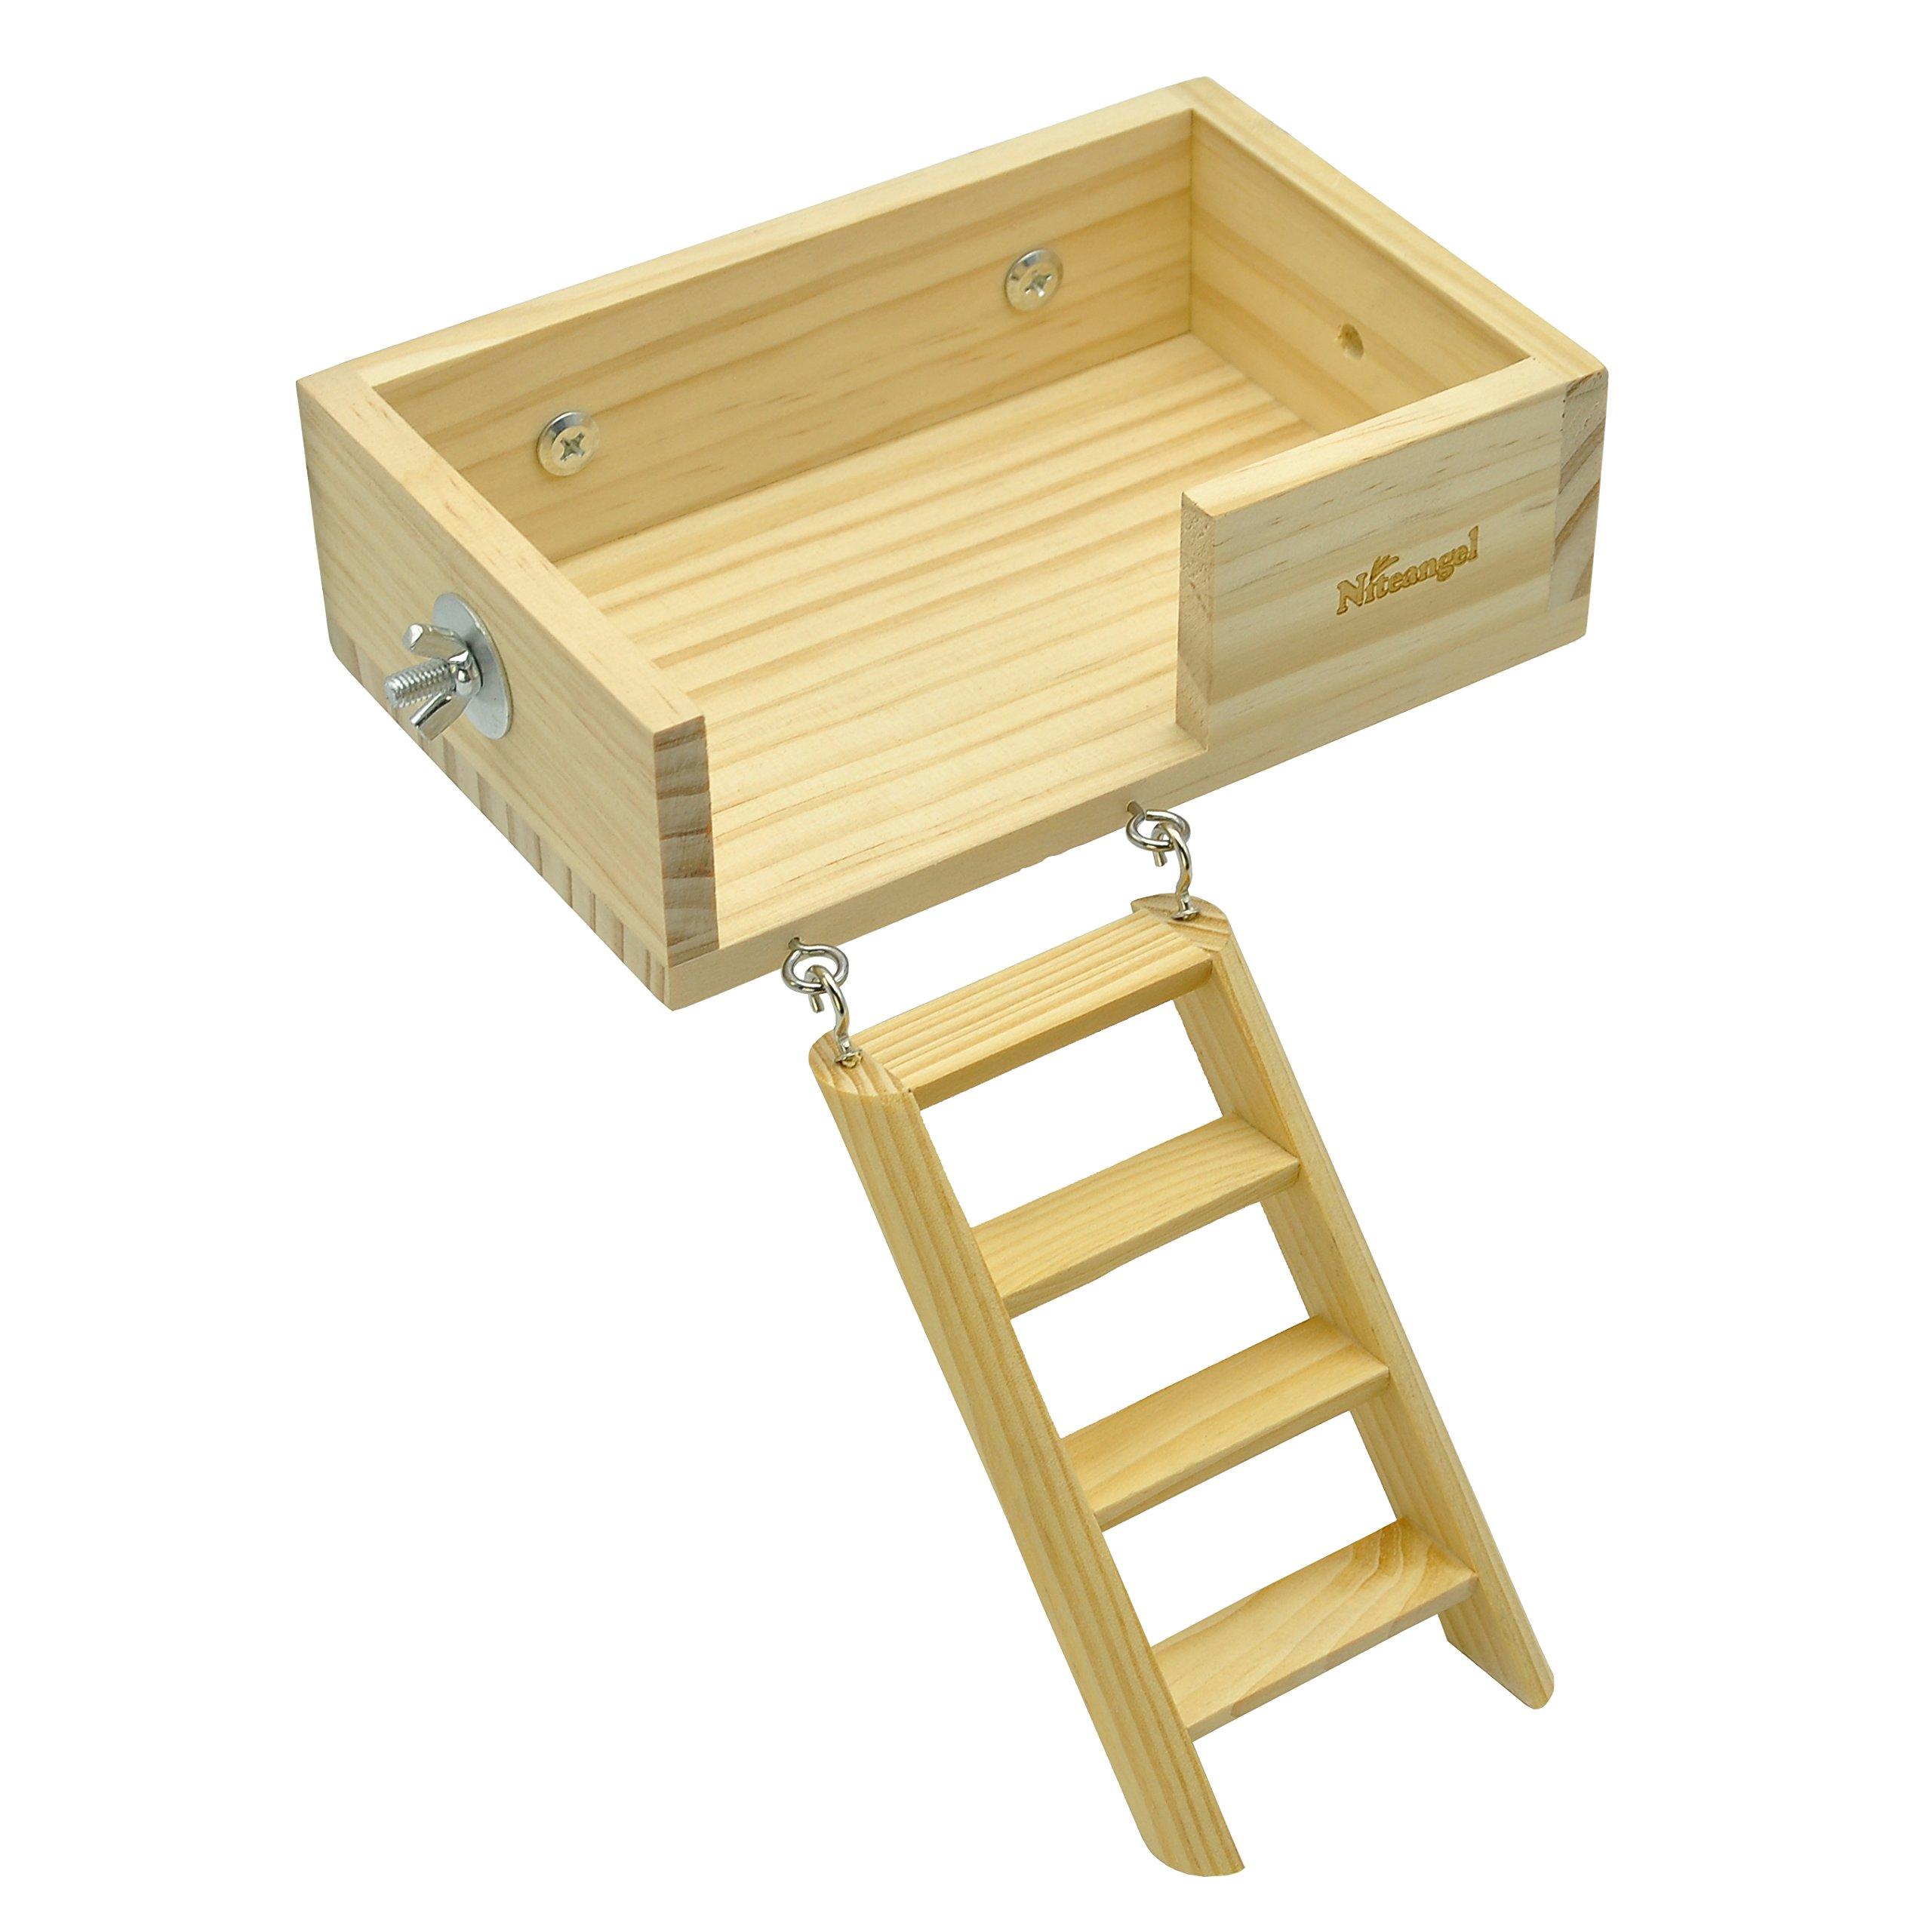 Niteangel Small Animal Wooden Platform, Climbing Kits